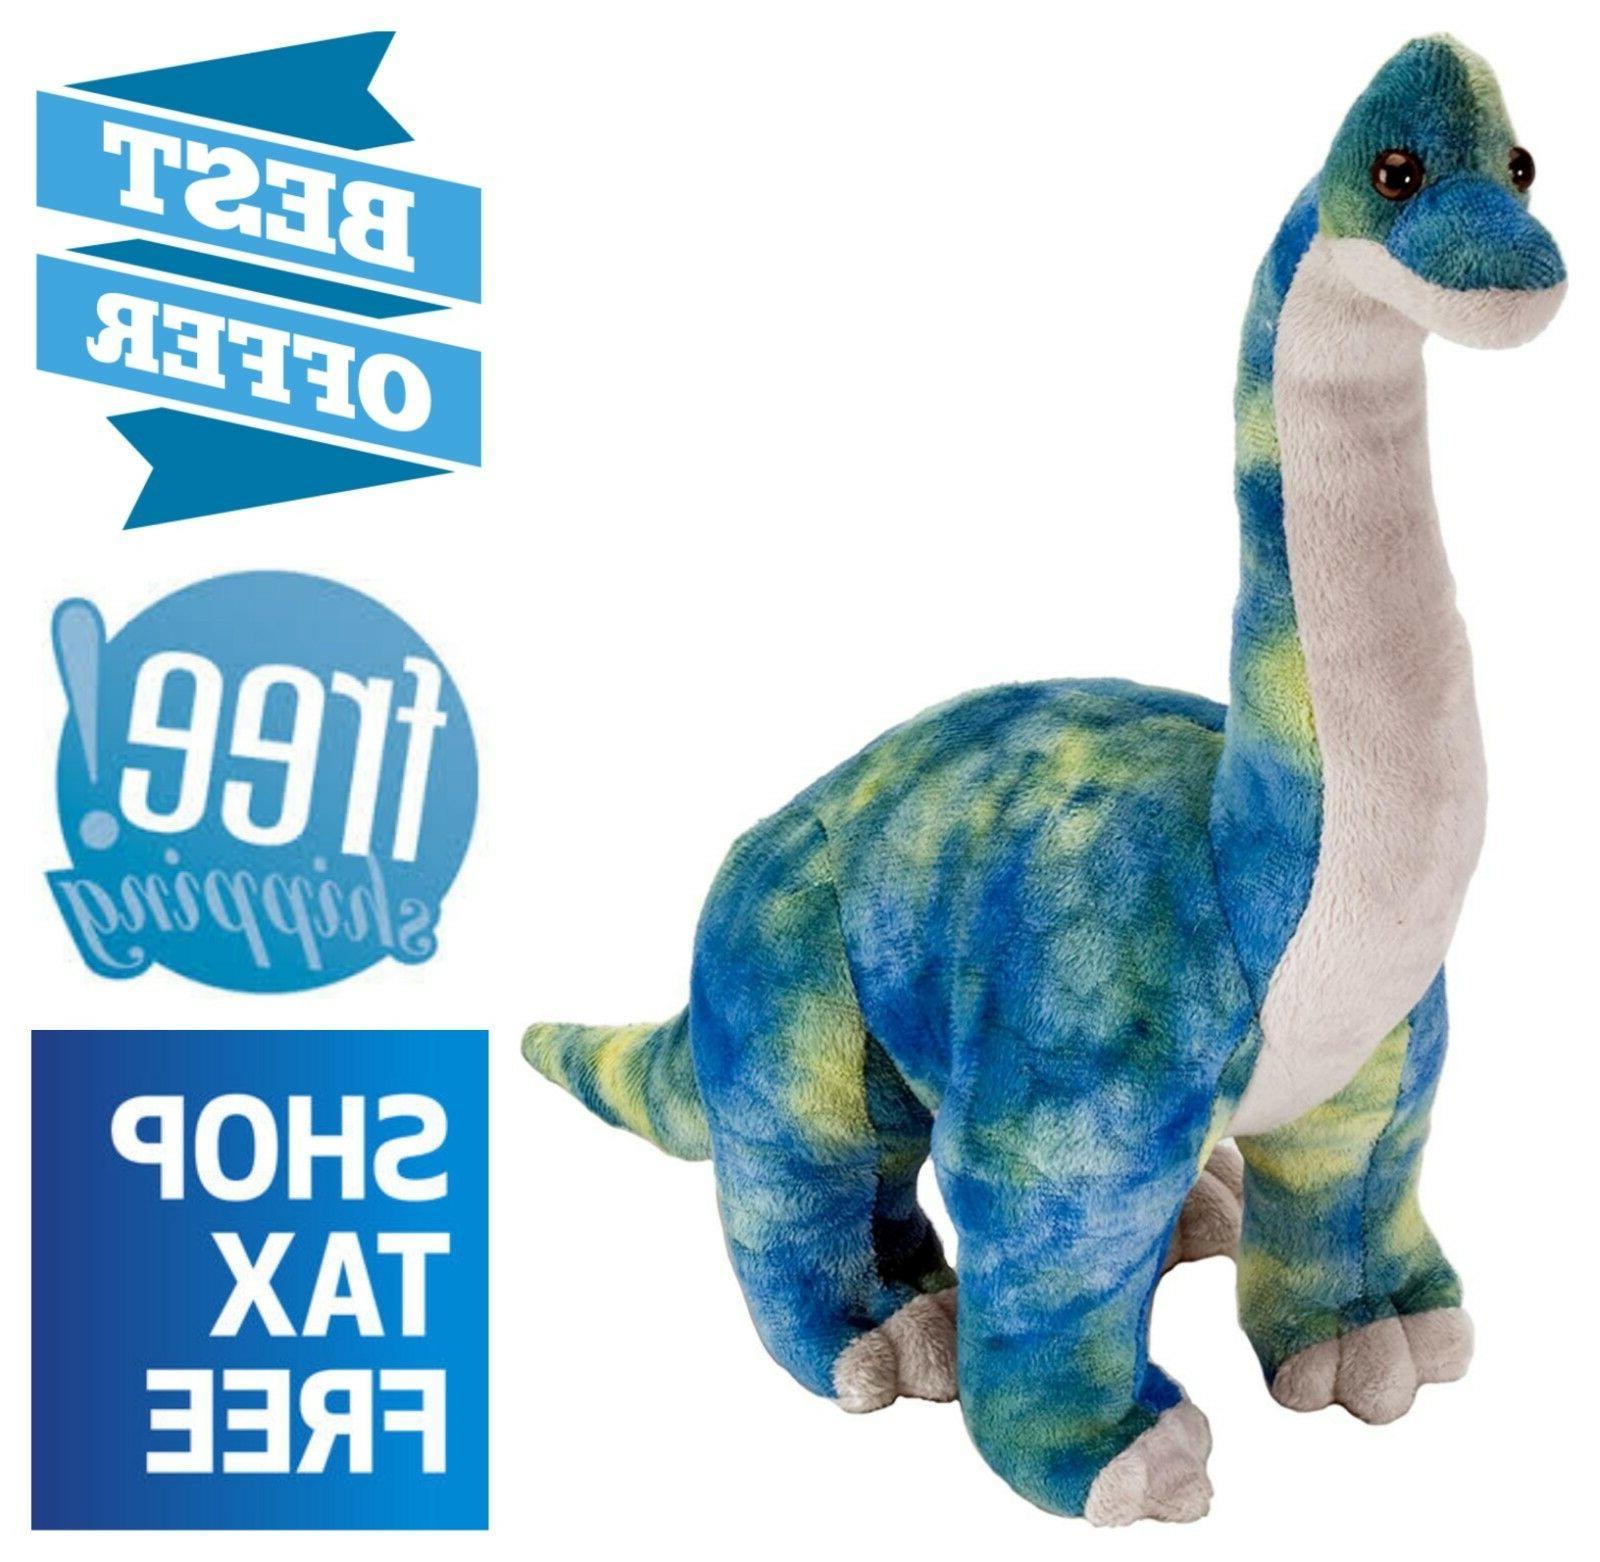 soft brachiosaurus dinosaur plush 10 cuddly stuffed